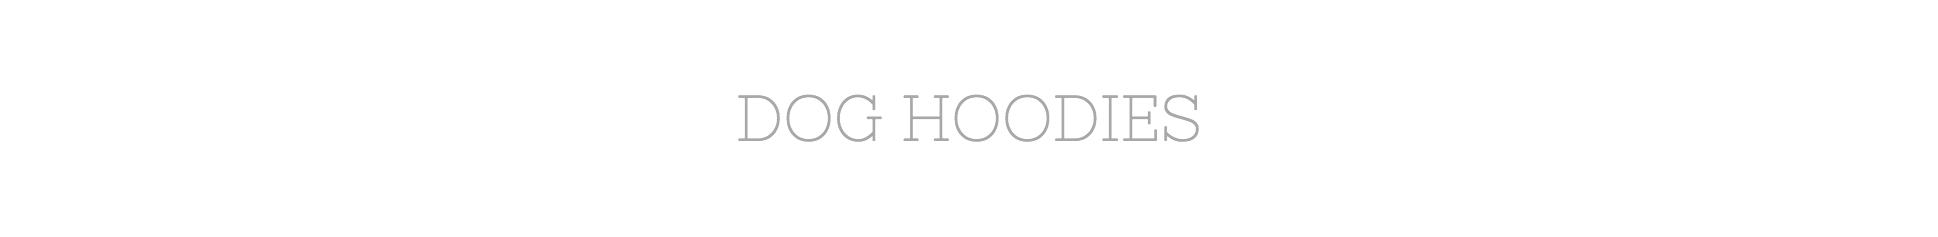 dog-hoodies.png